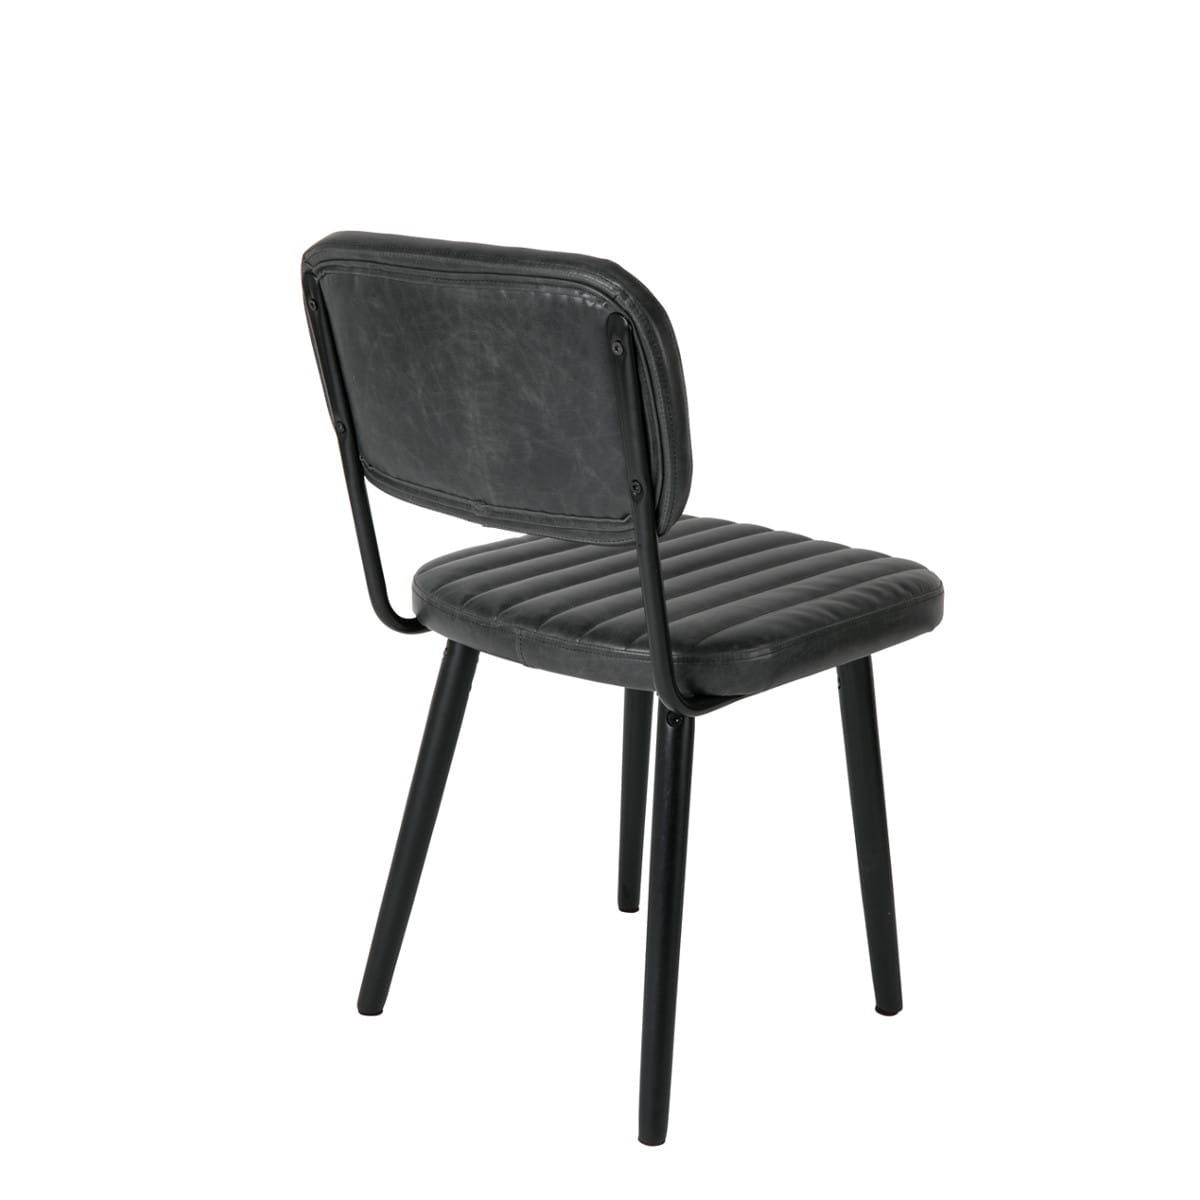 Prime Chair Jake Black White Label Living Download Free Architecture Designs Scobabritishbridgeorg